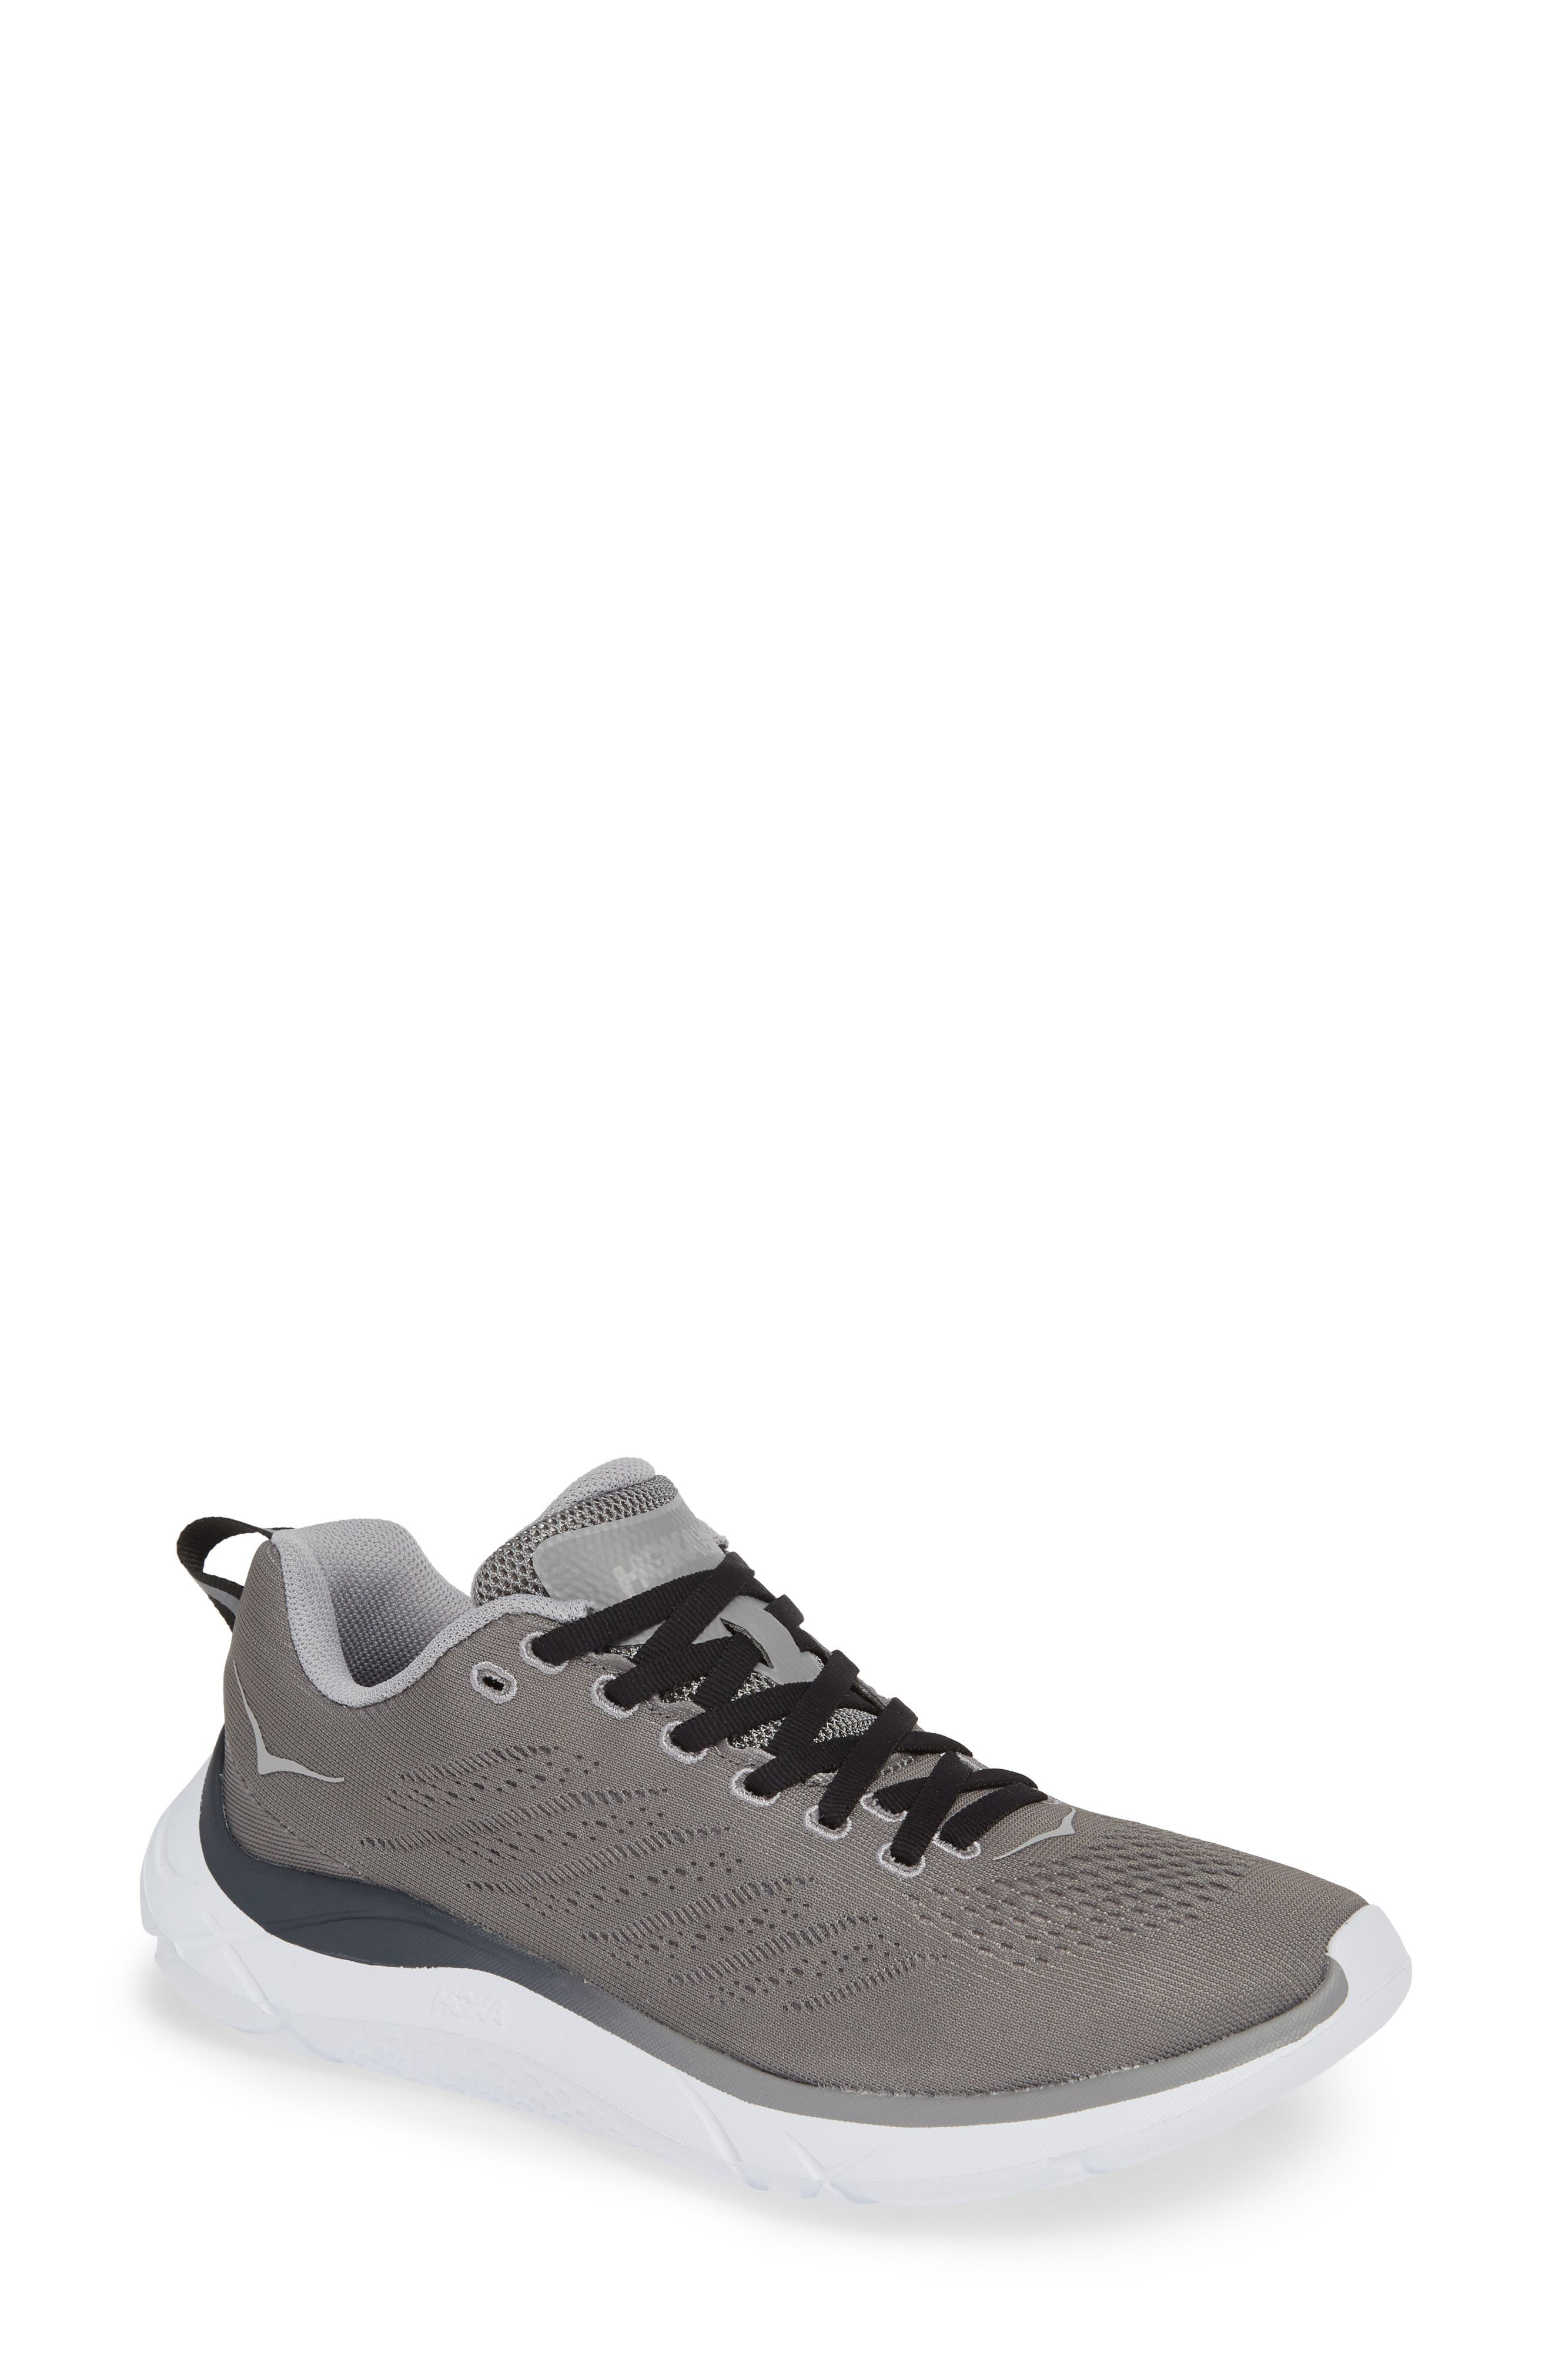 Hoka One One Hupana Em Sneaker, Grey